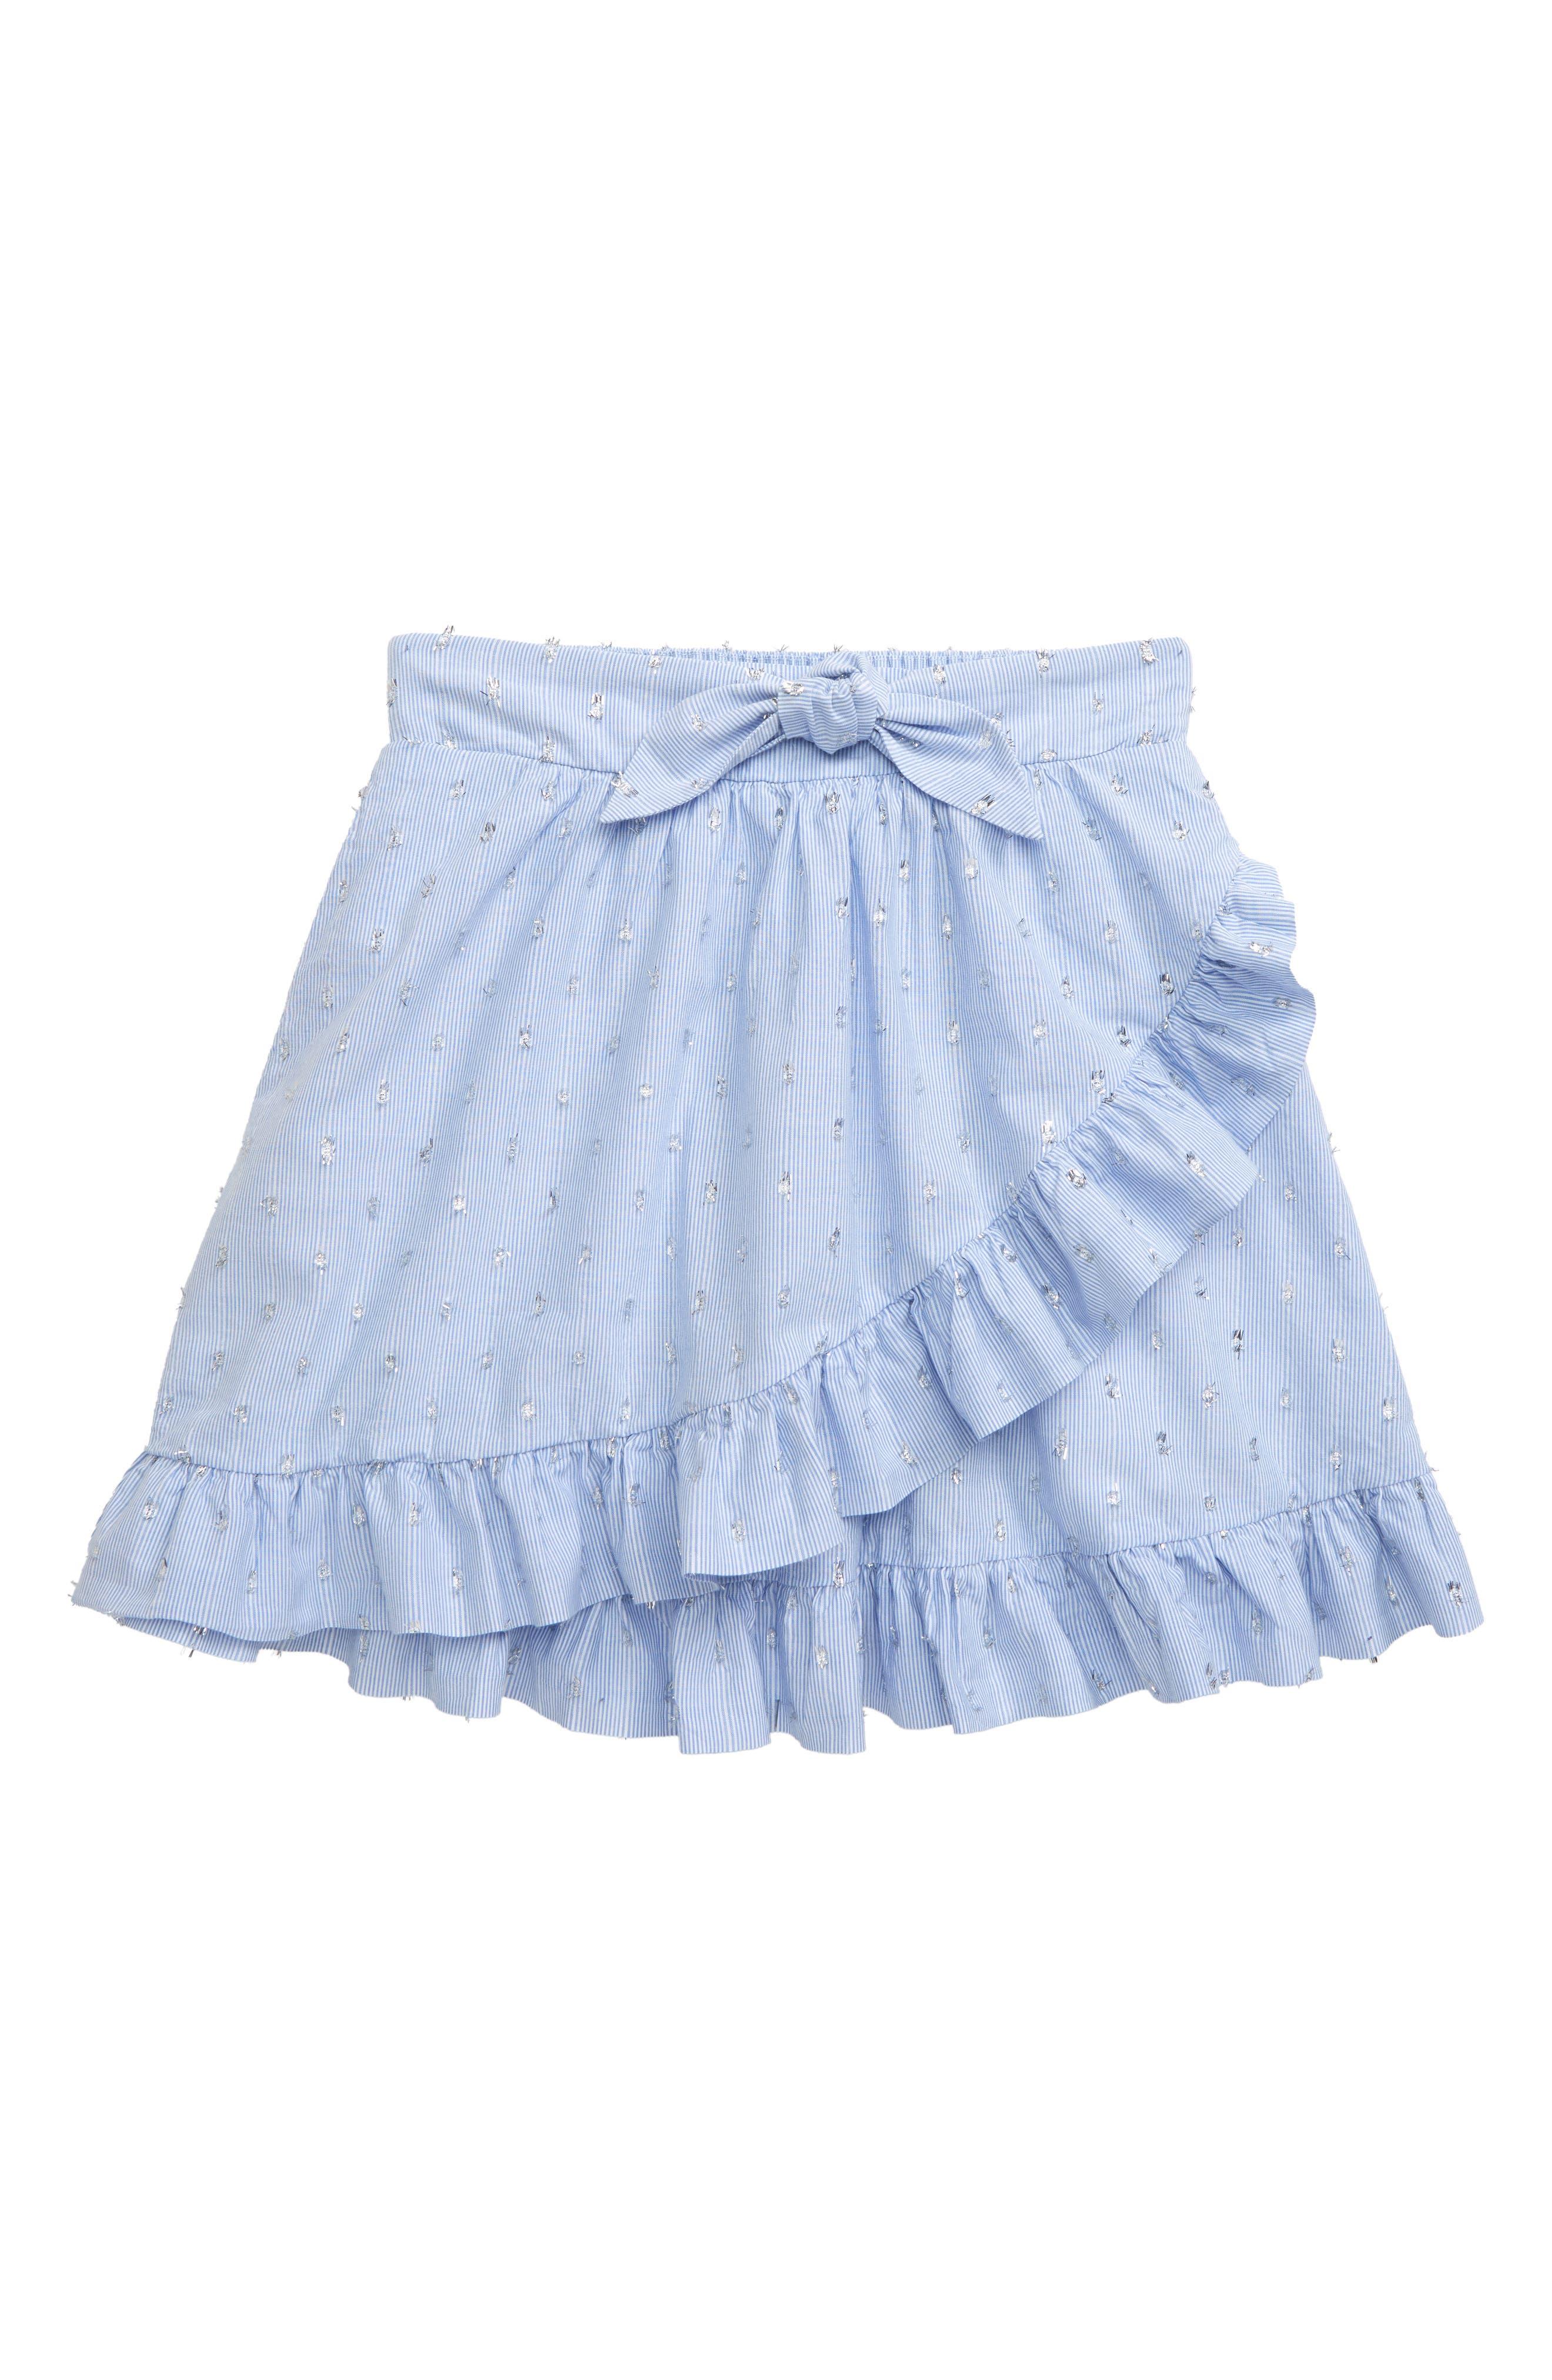 Soft Pink 4T Hurley Skirt